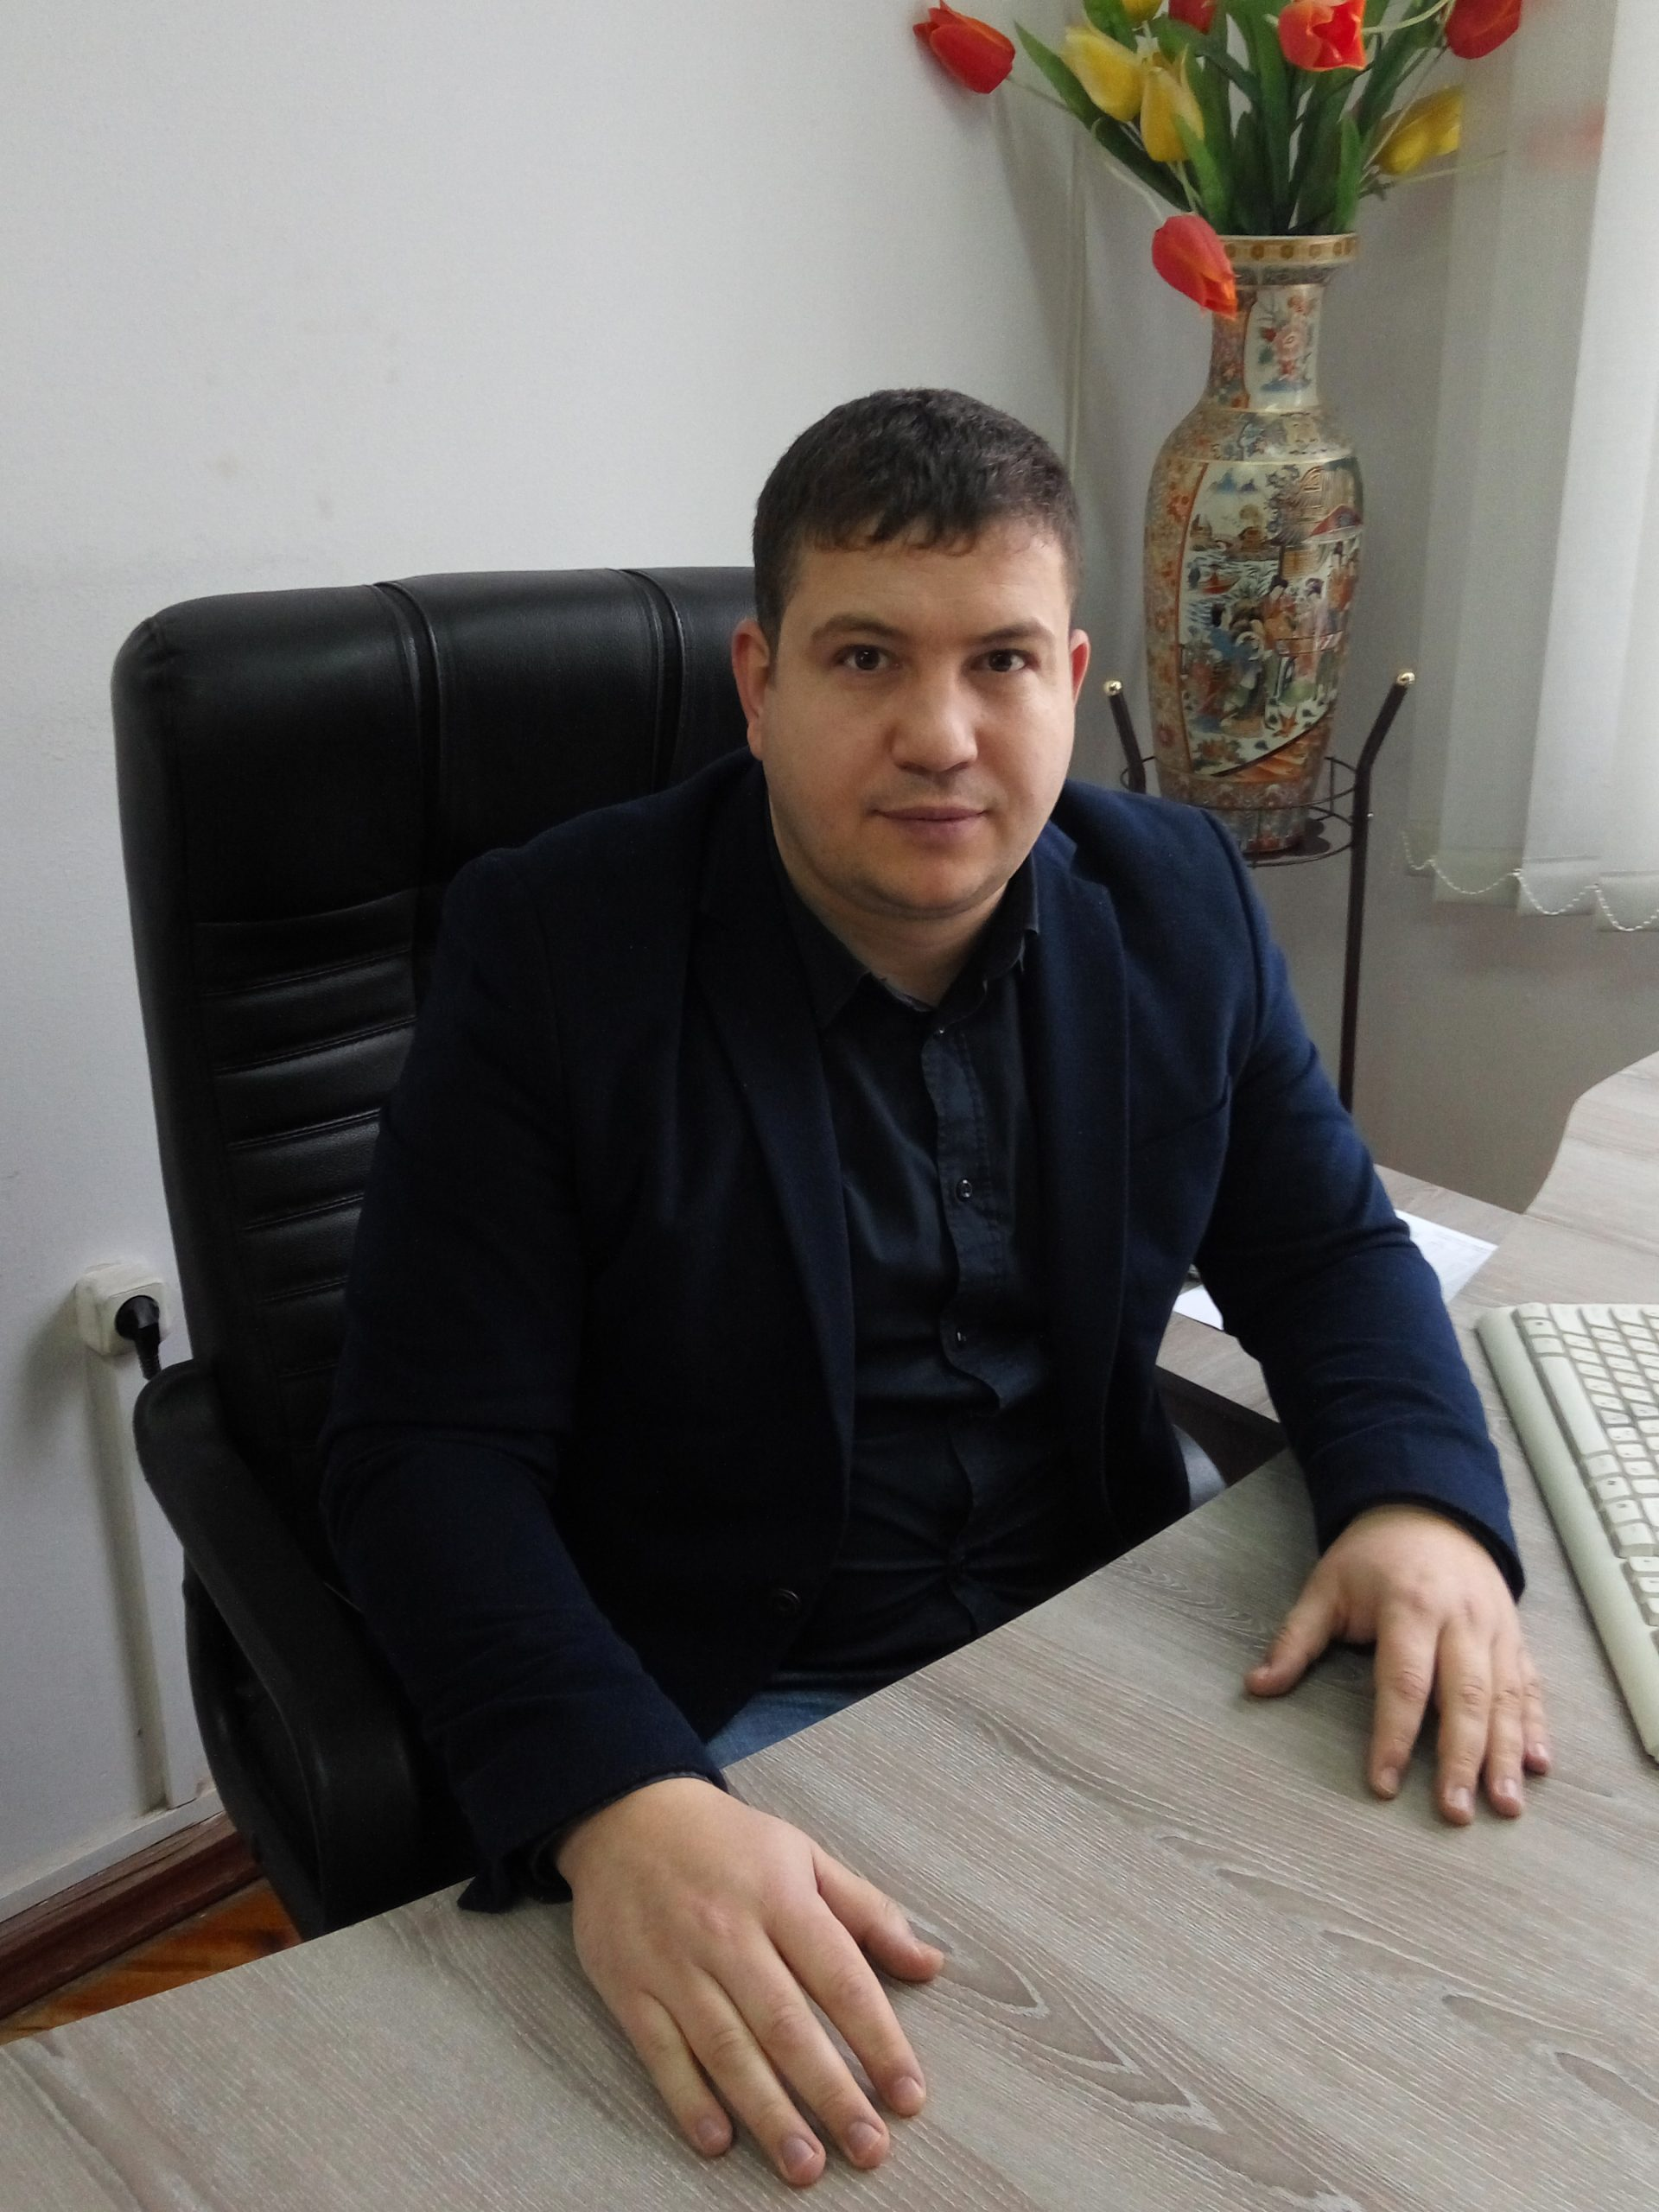 Nicolae Rozenbac